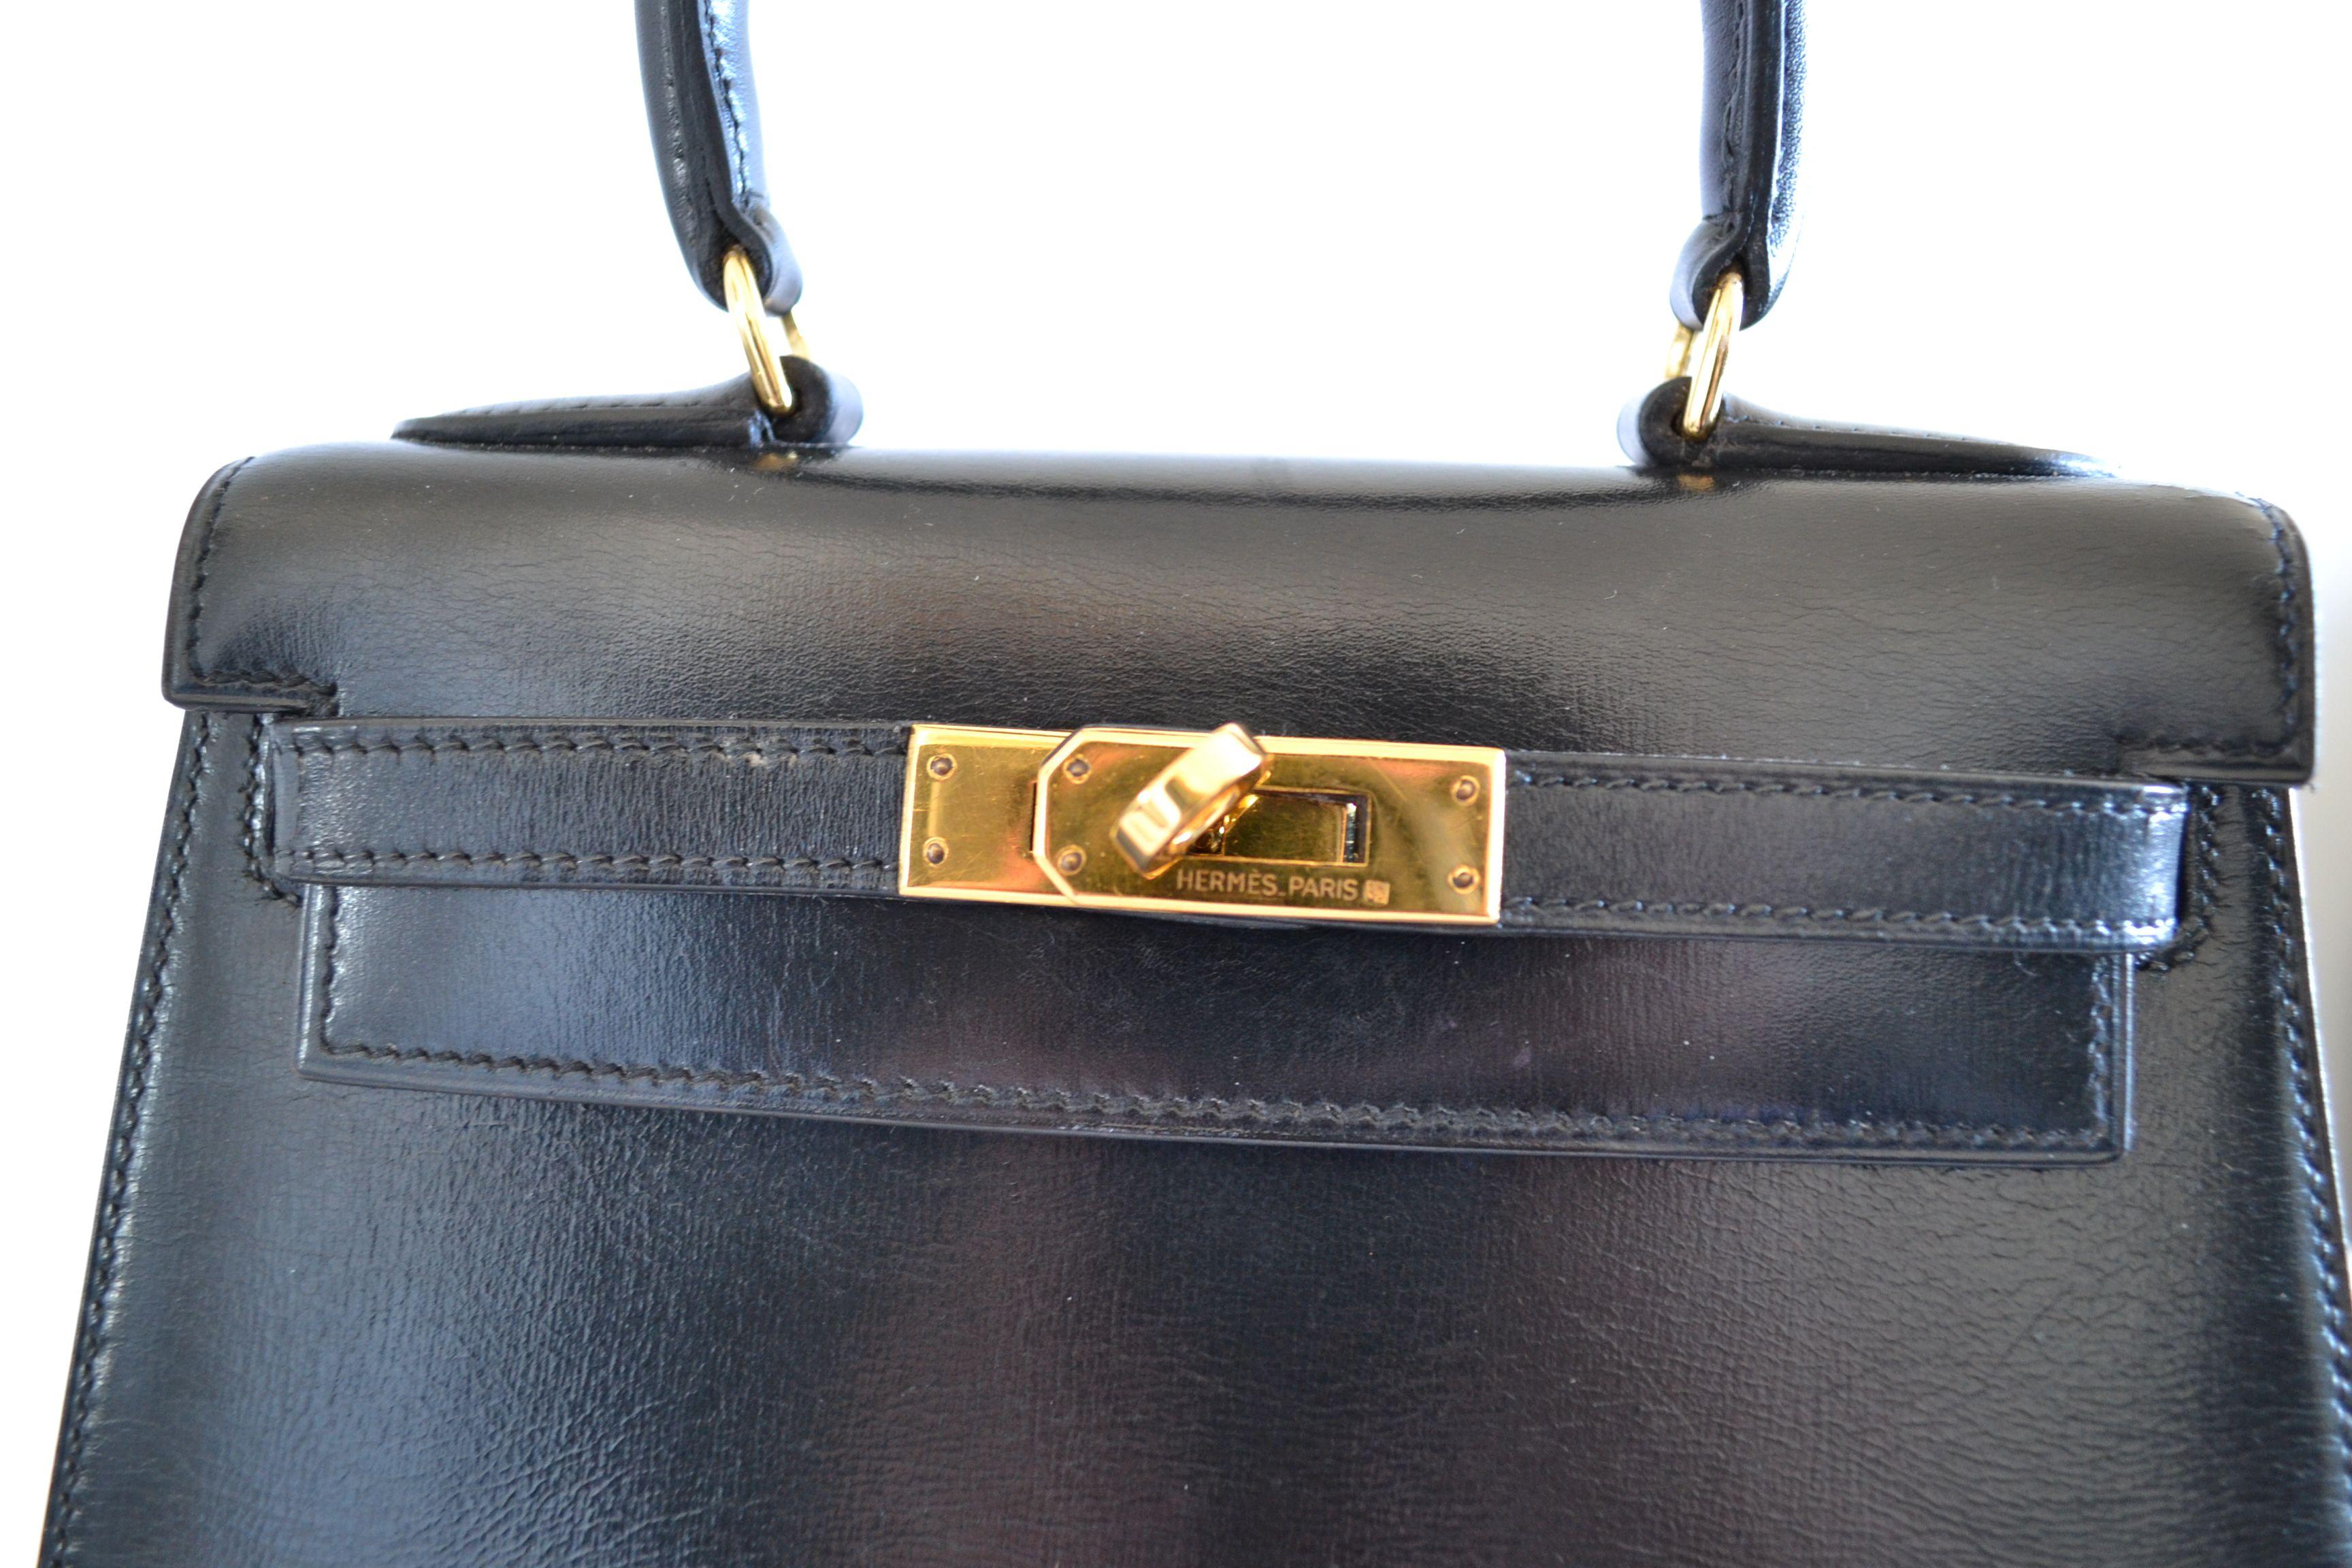 Sac Hermès  Kelly 20 Box noir